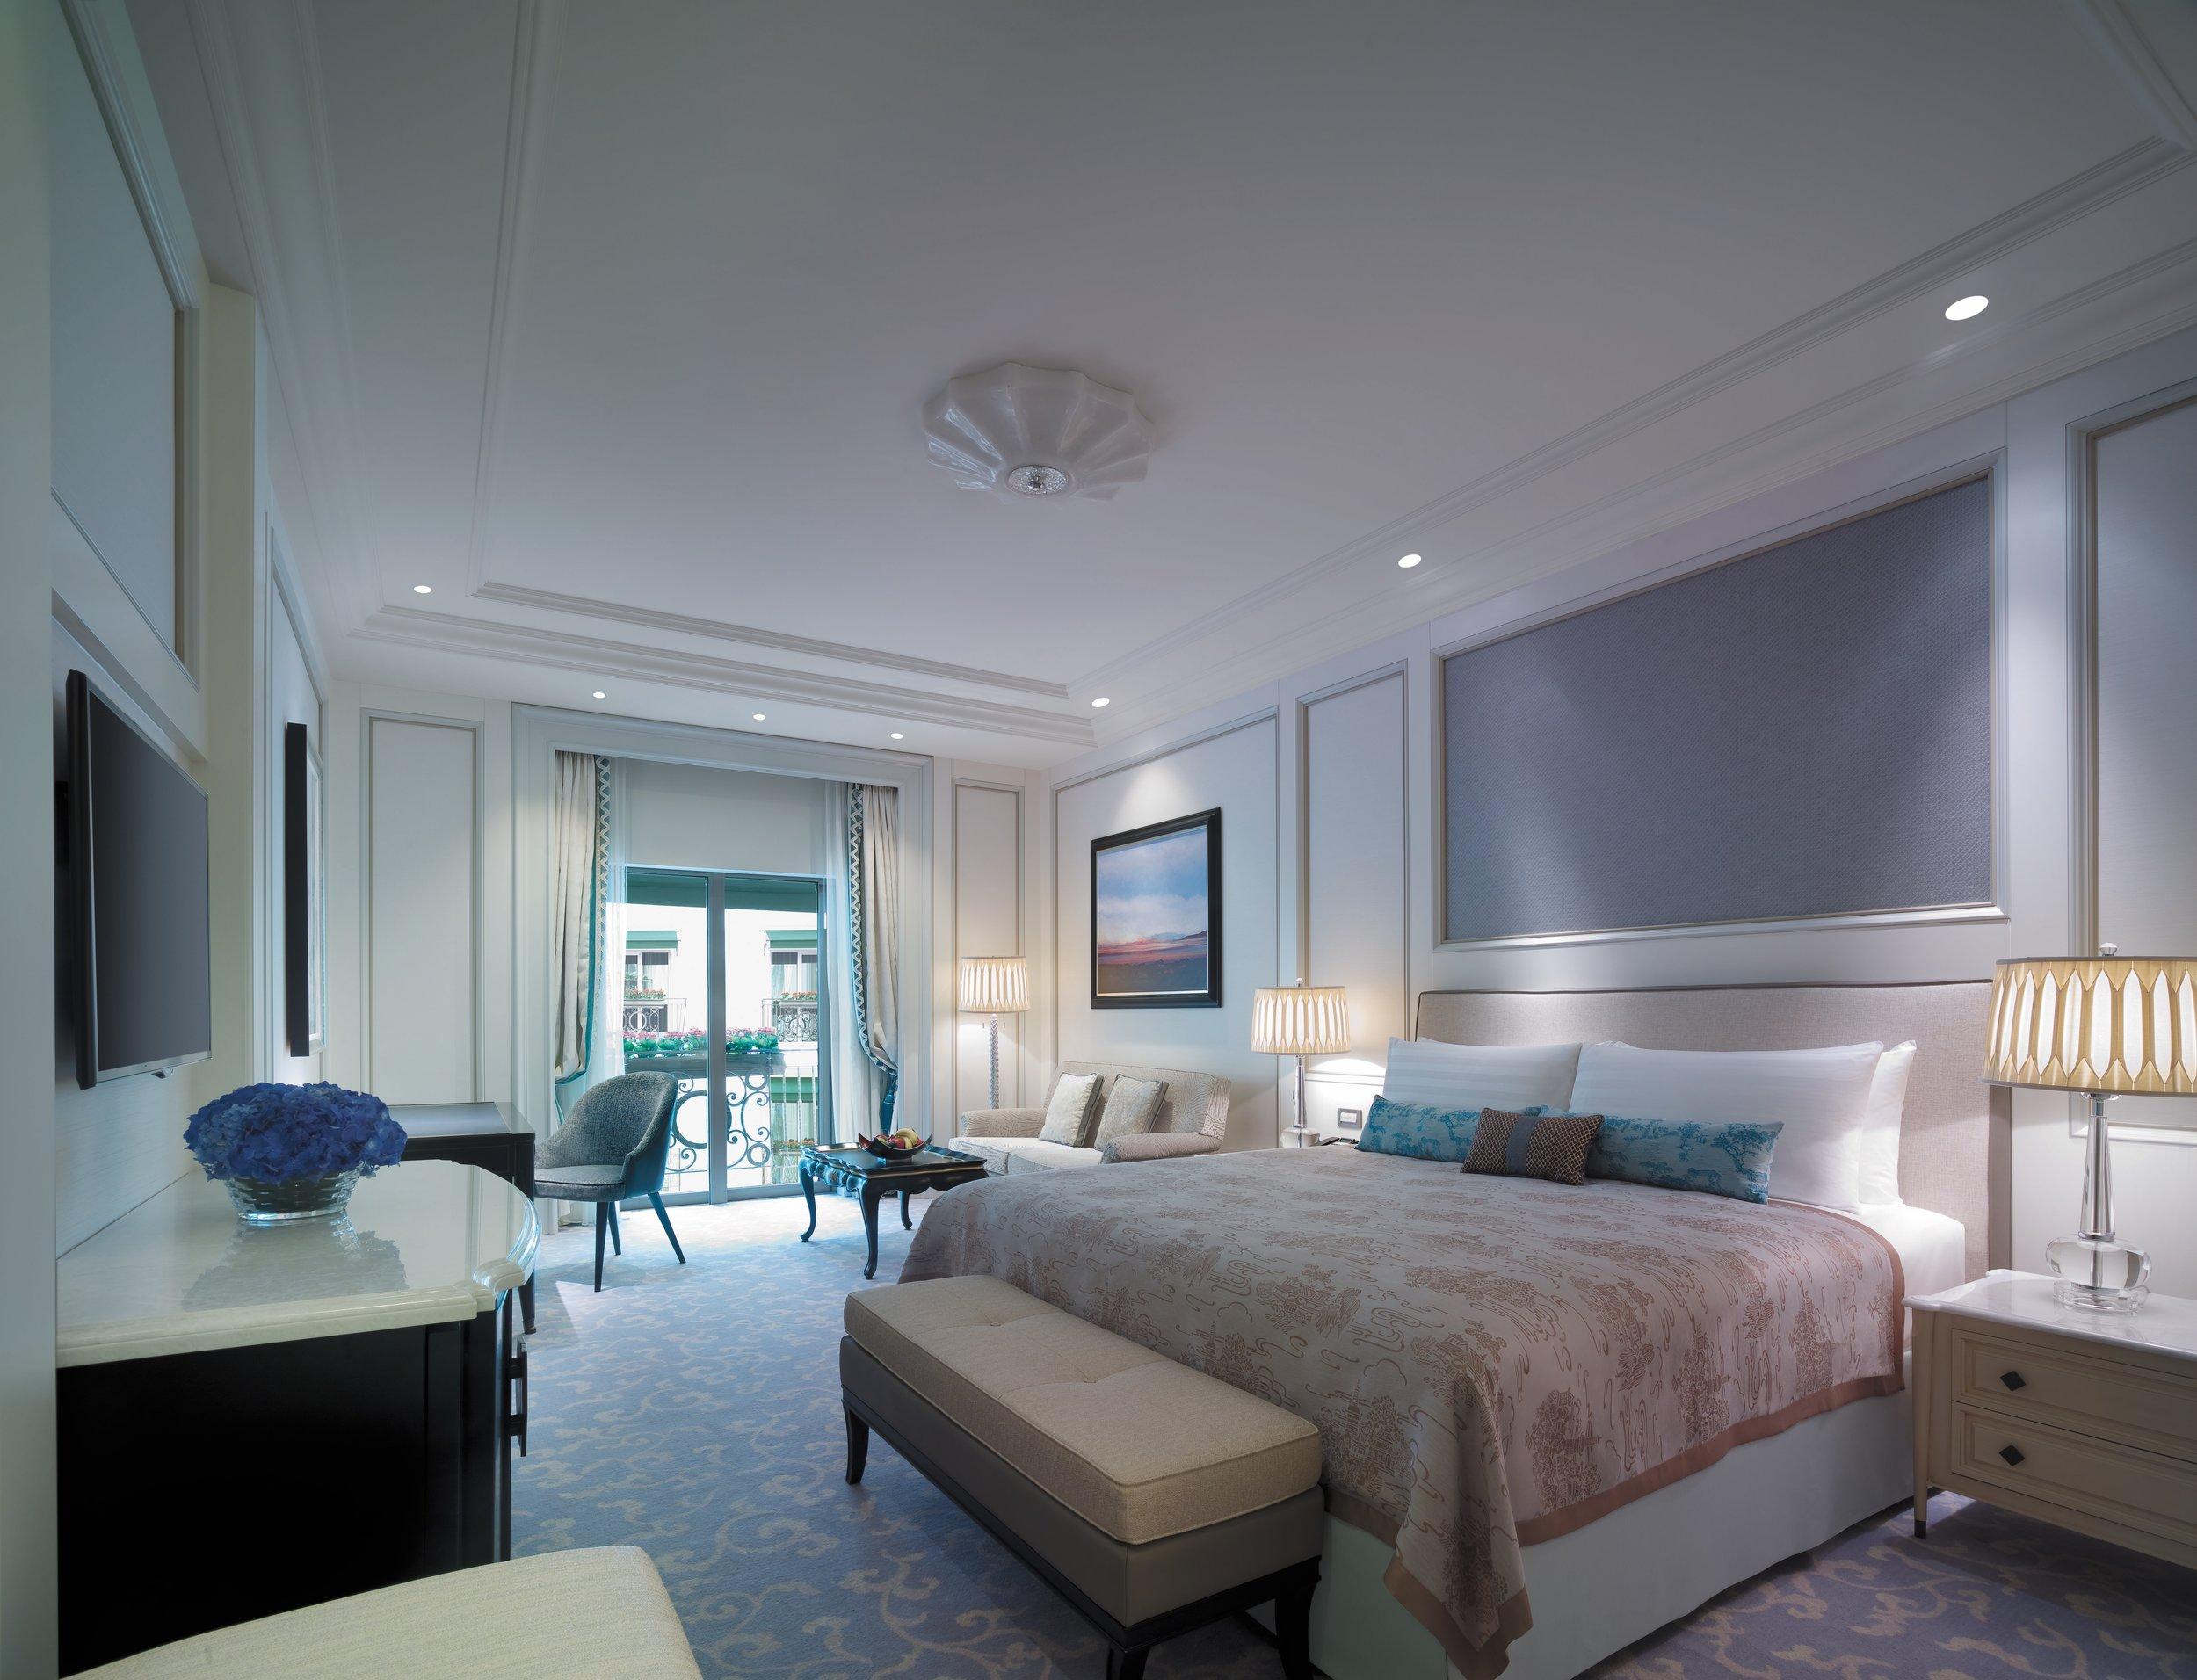 GUEST ROOM @ BOSPHORUS SHANGRI-LA, ISTANBUL